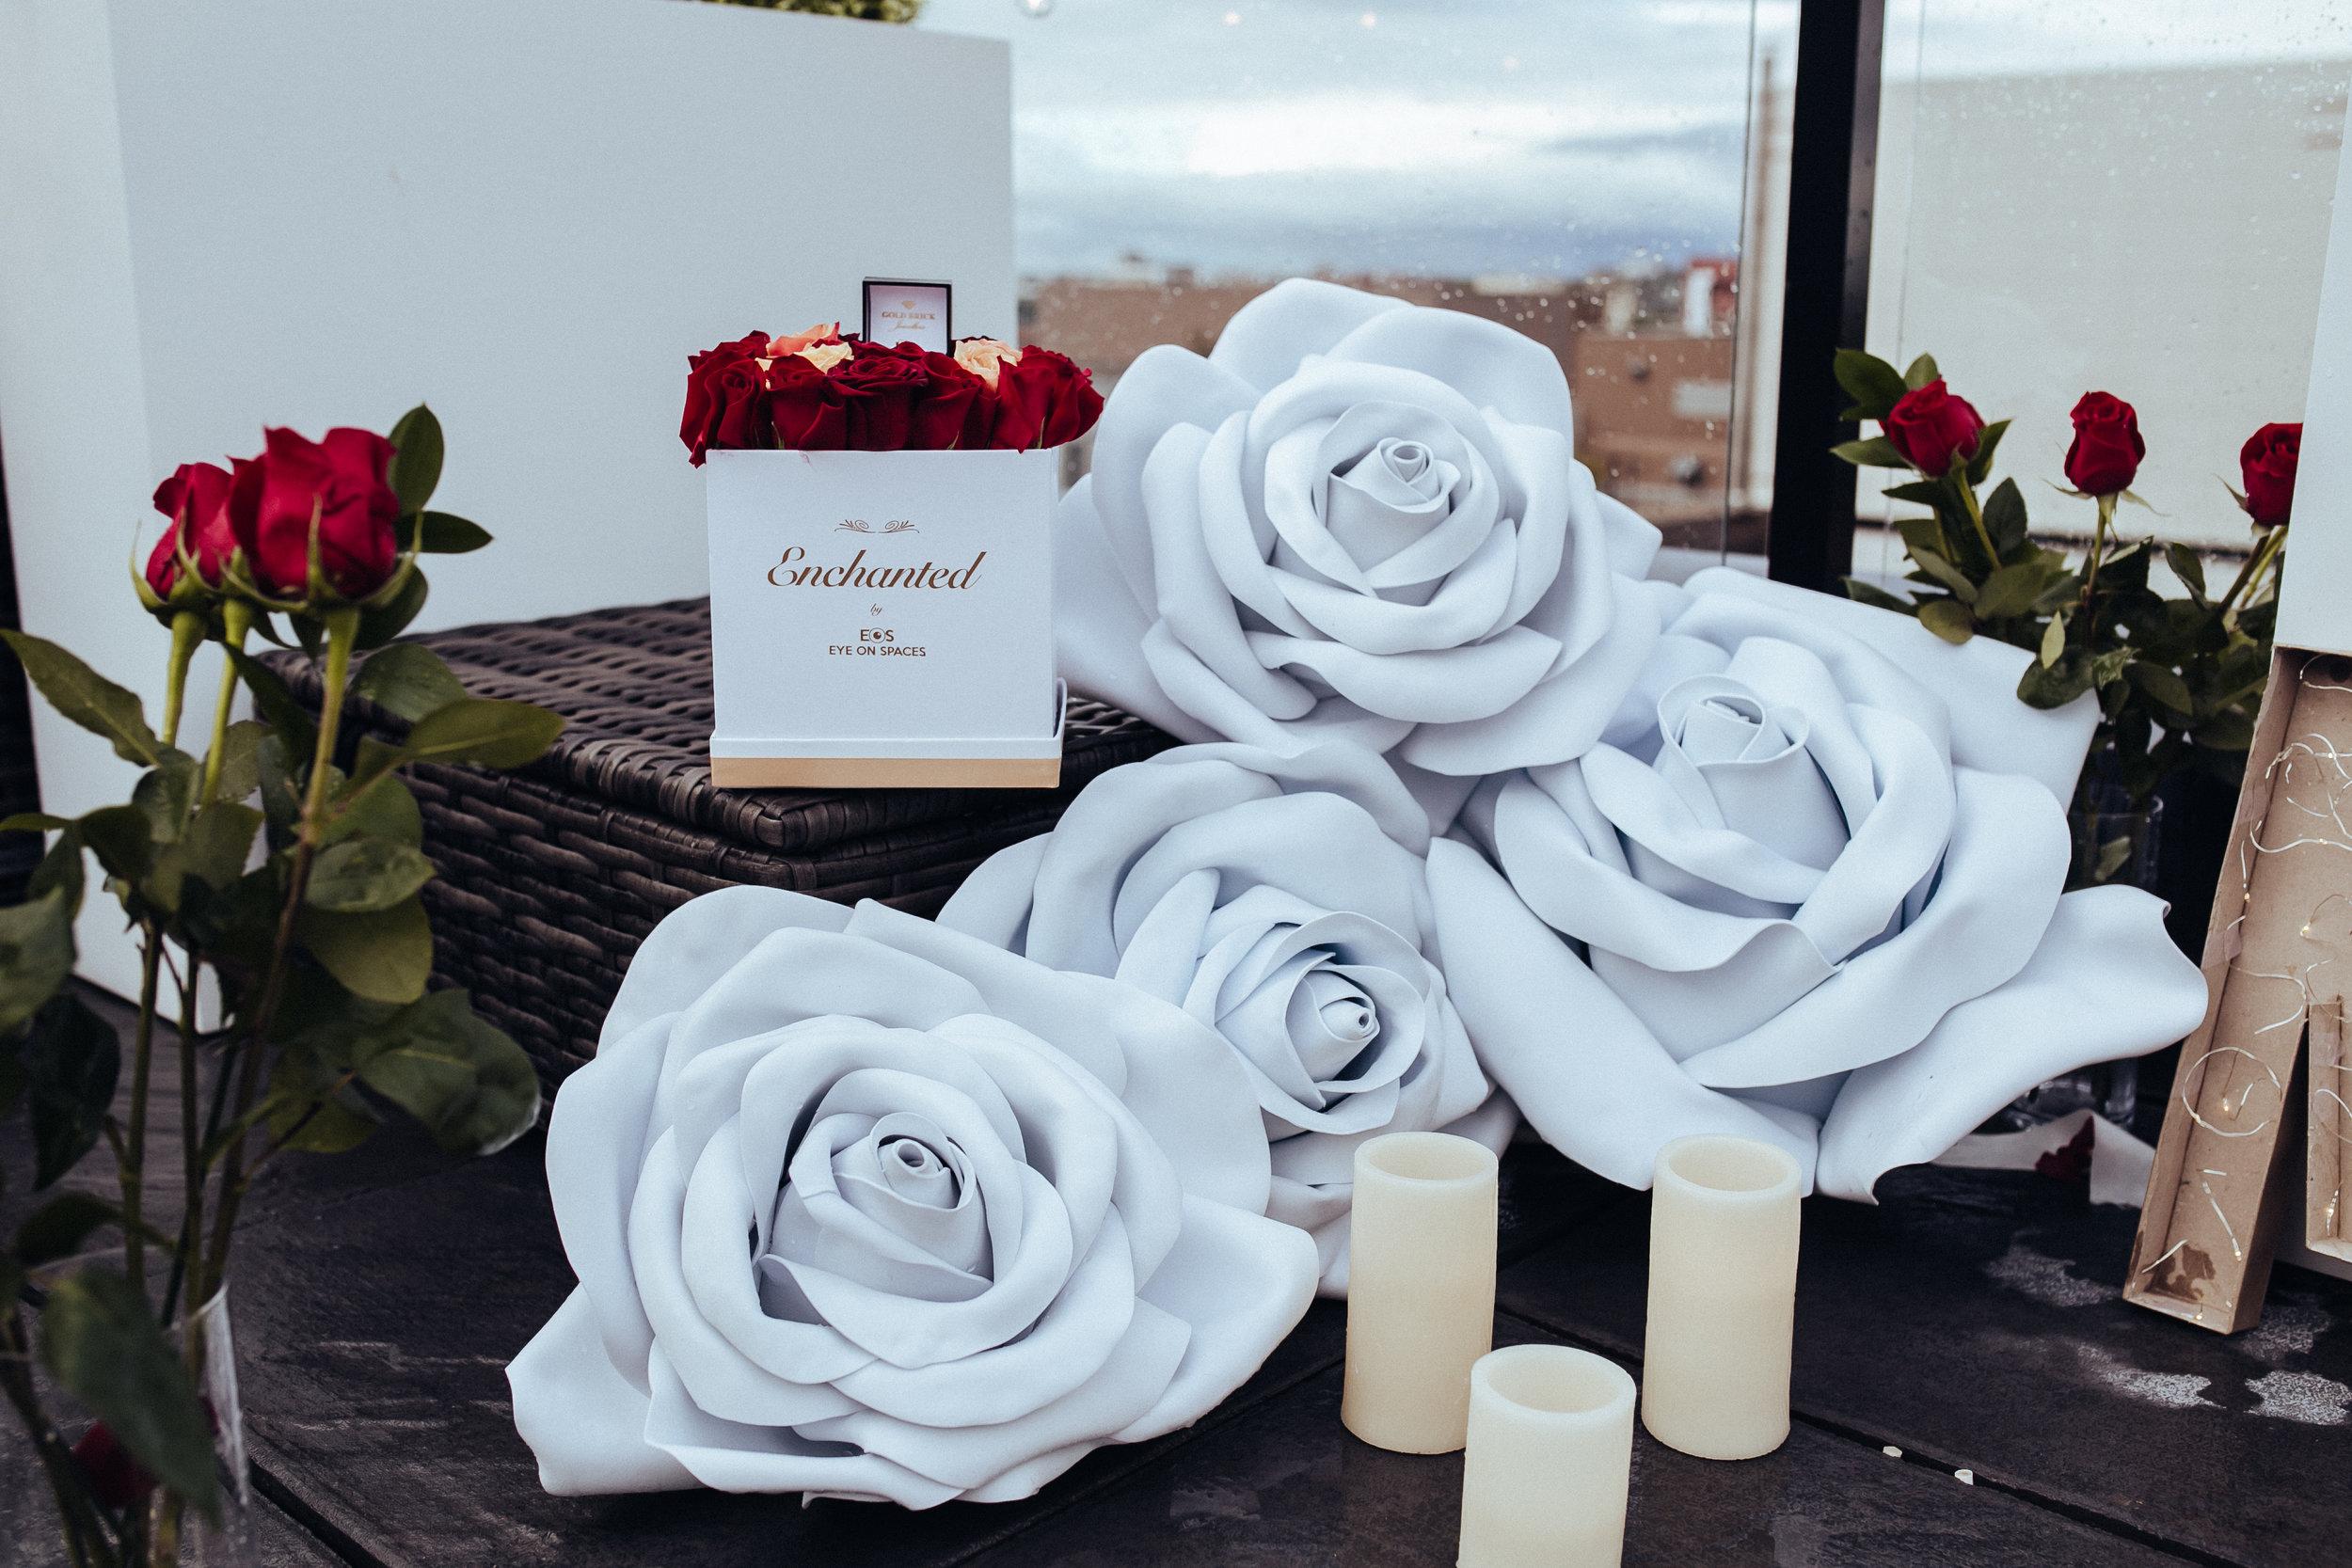 Enchanted_Proposal_2018-19.jpg